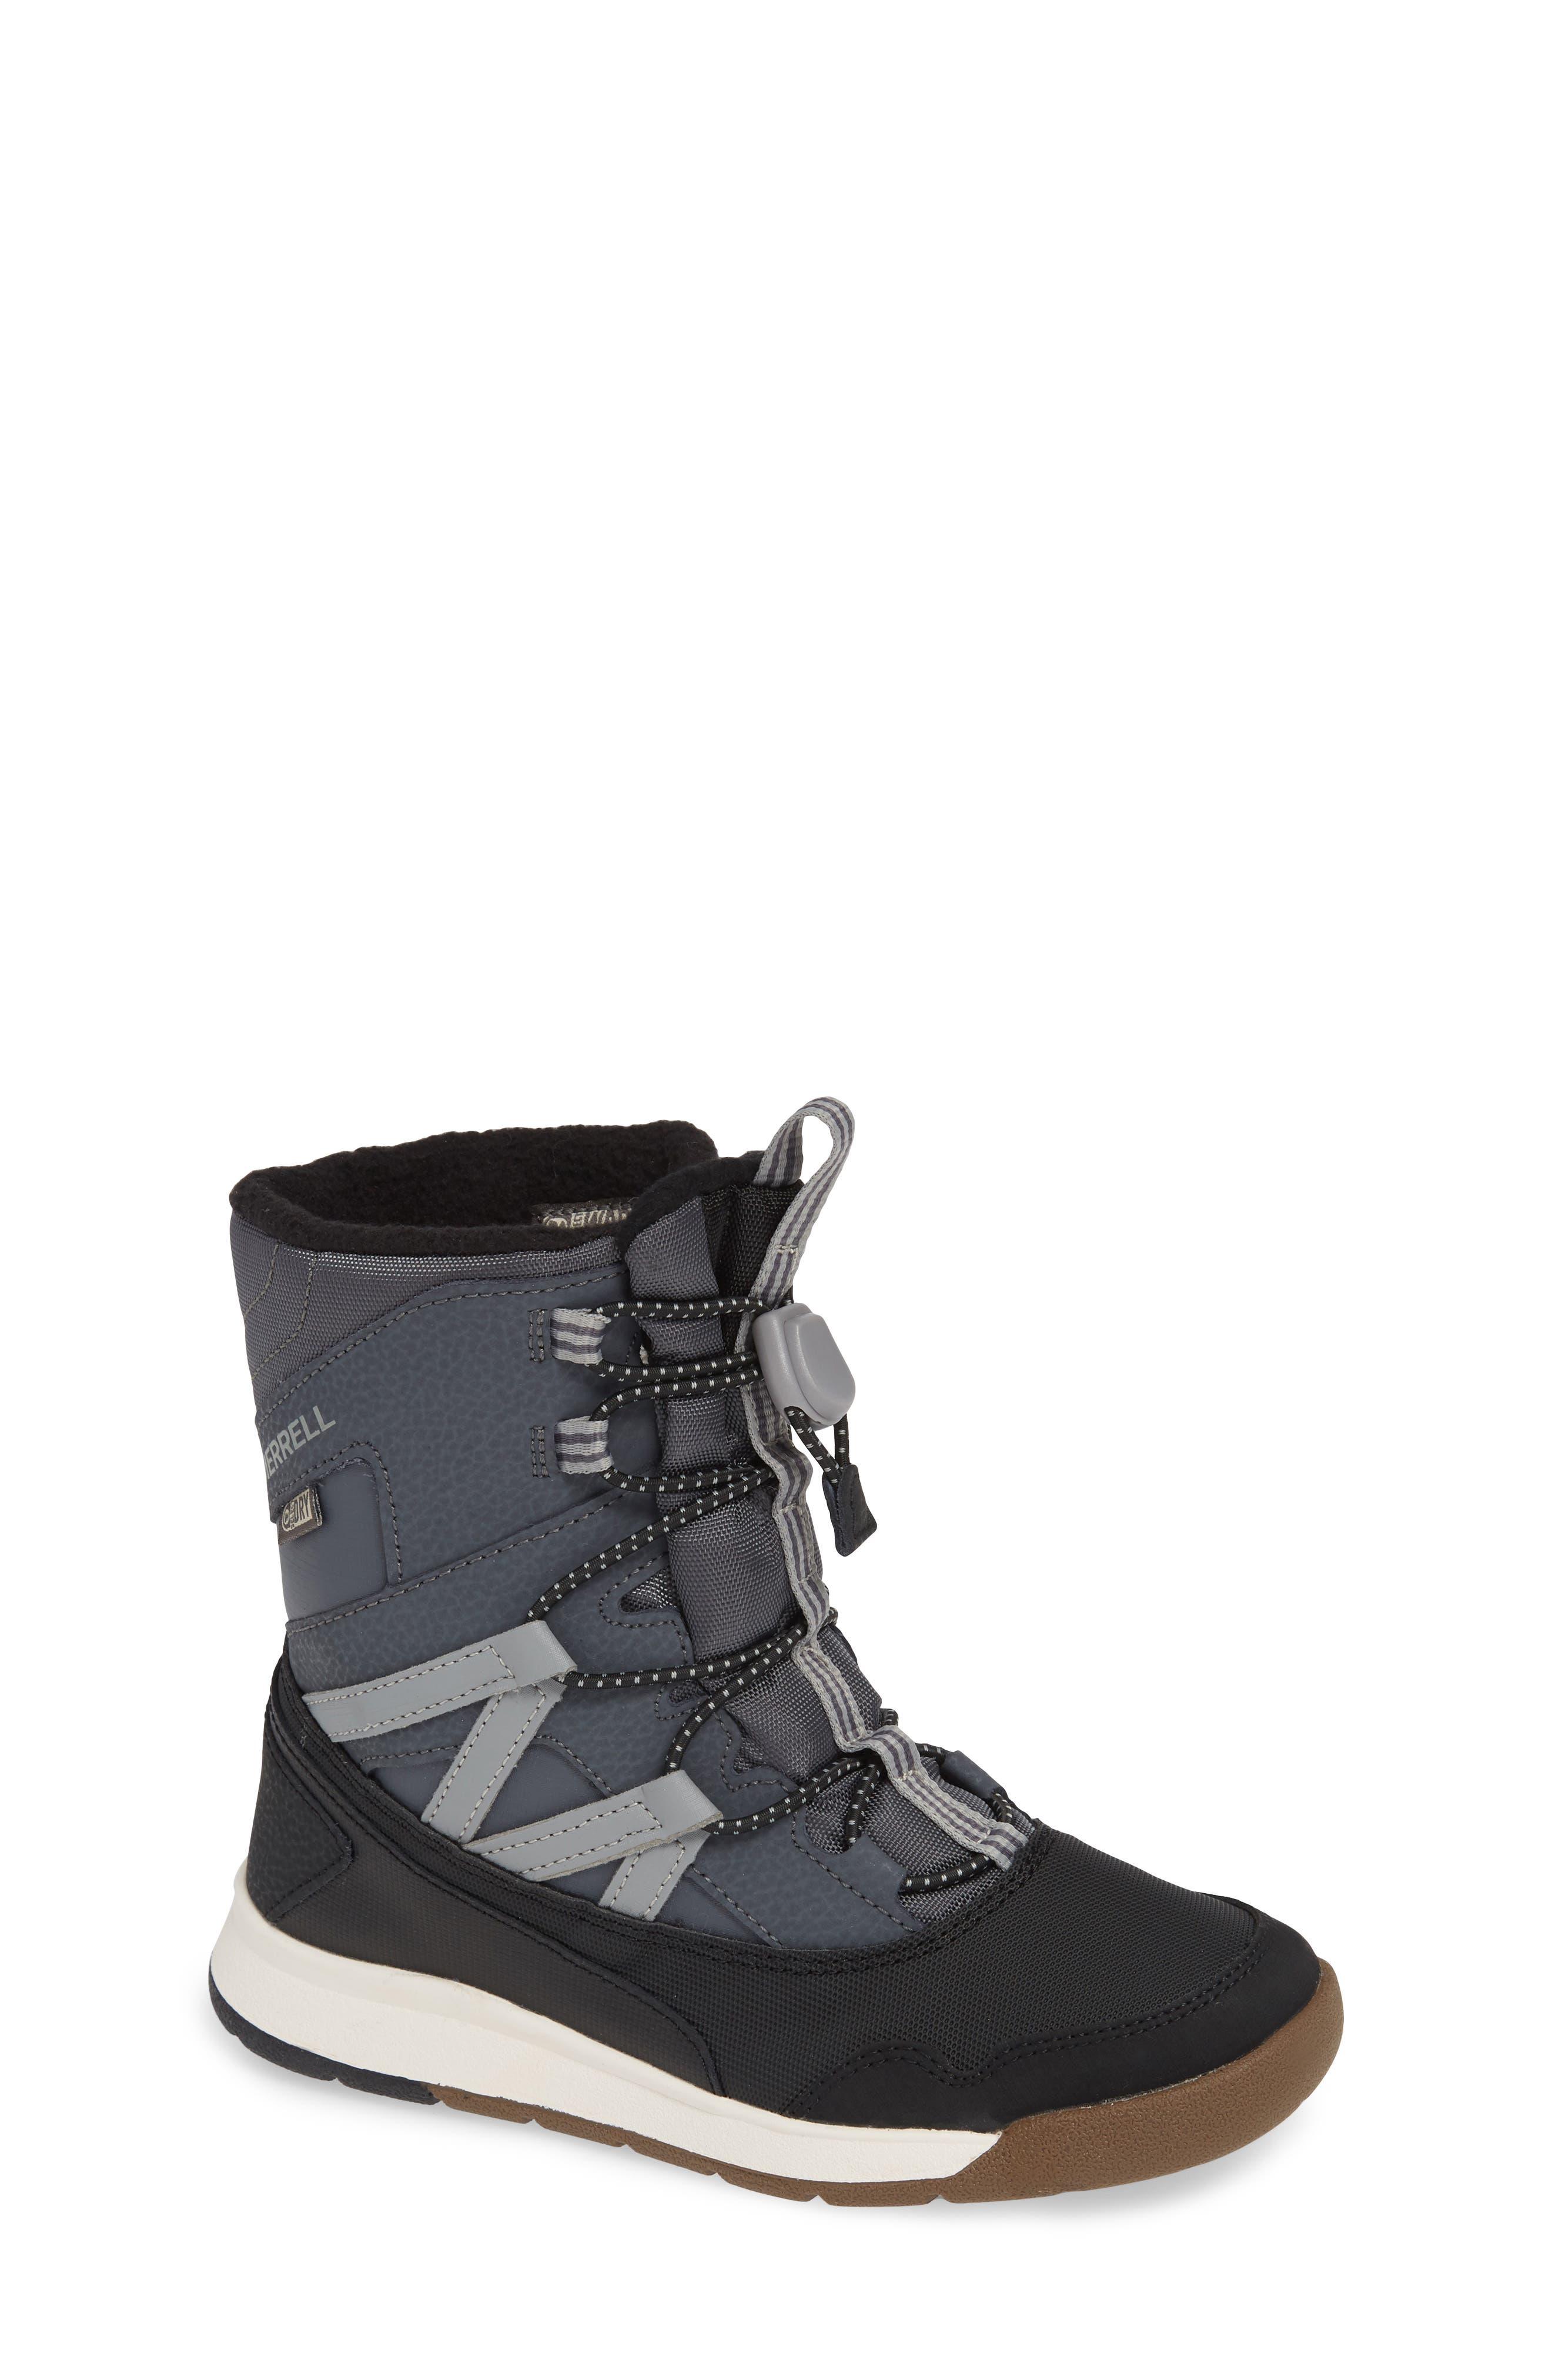 MERRELL Snow Crush Waterproof Snow Boot, Main, color, 020